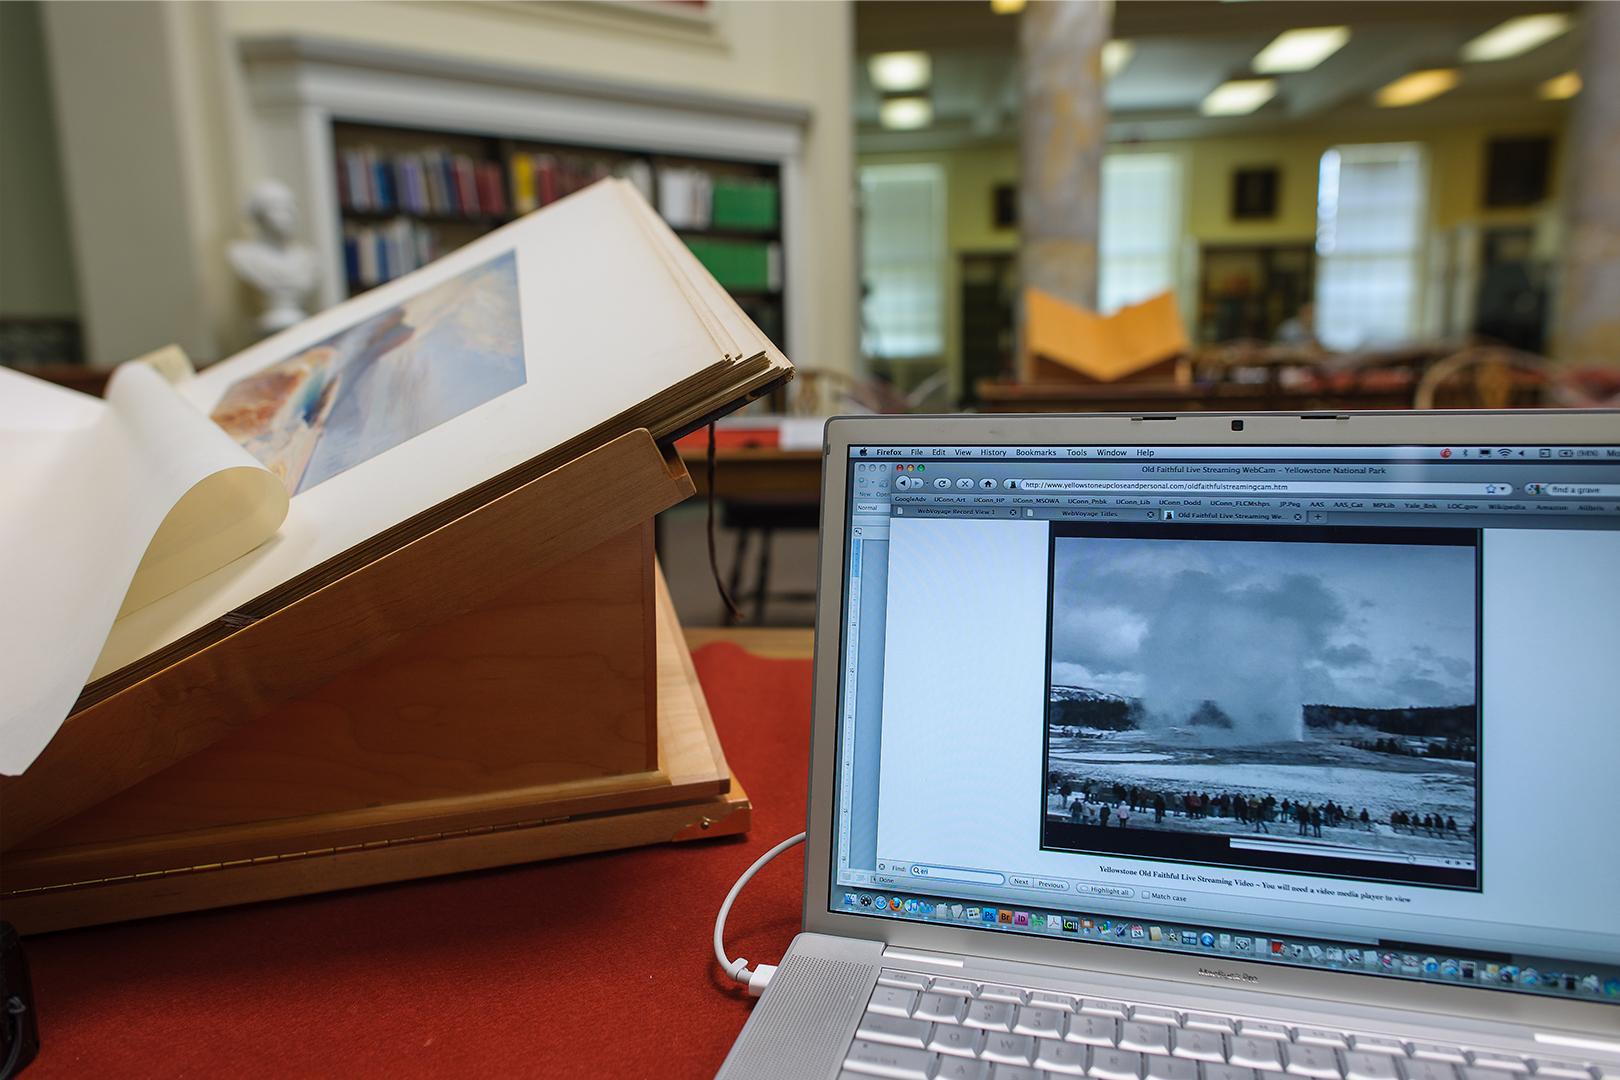 Old Faithful Erupting on Live Web Cam & Prang Portfolio of Moran Sketches, American Antiquarian Society